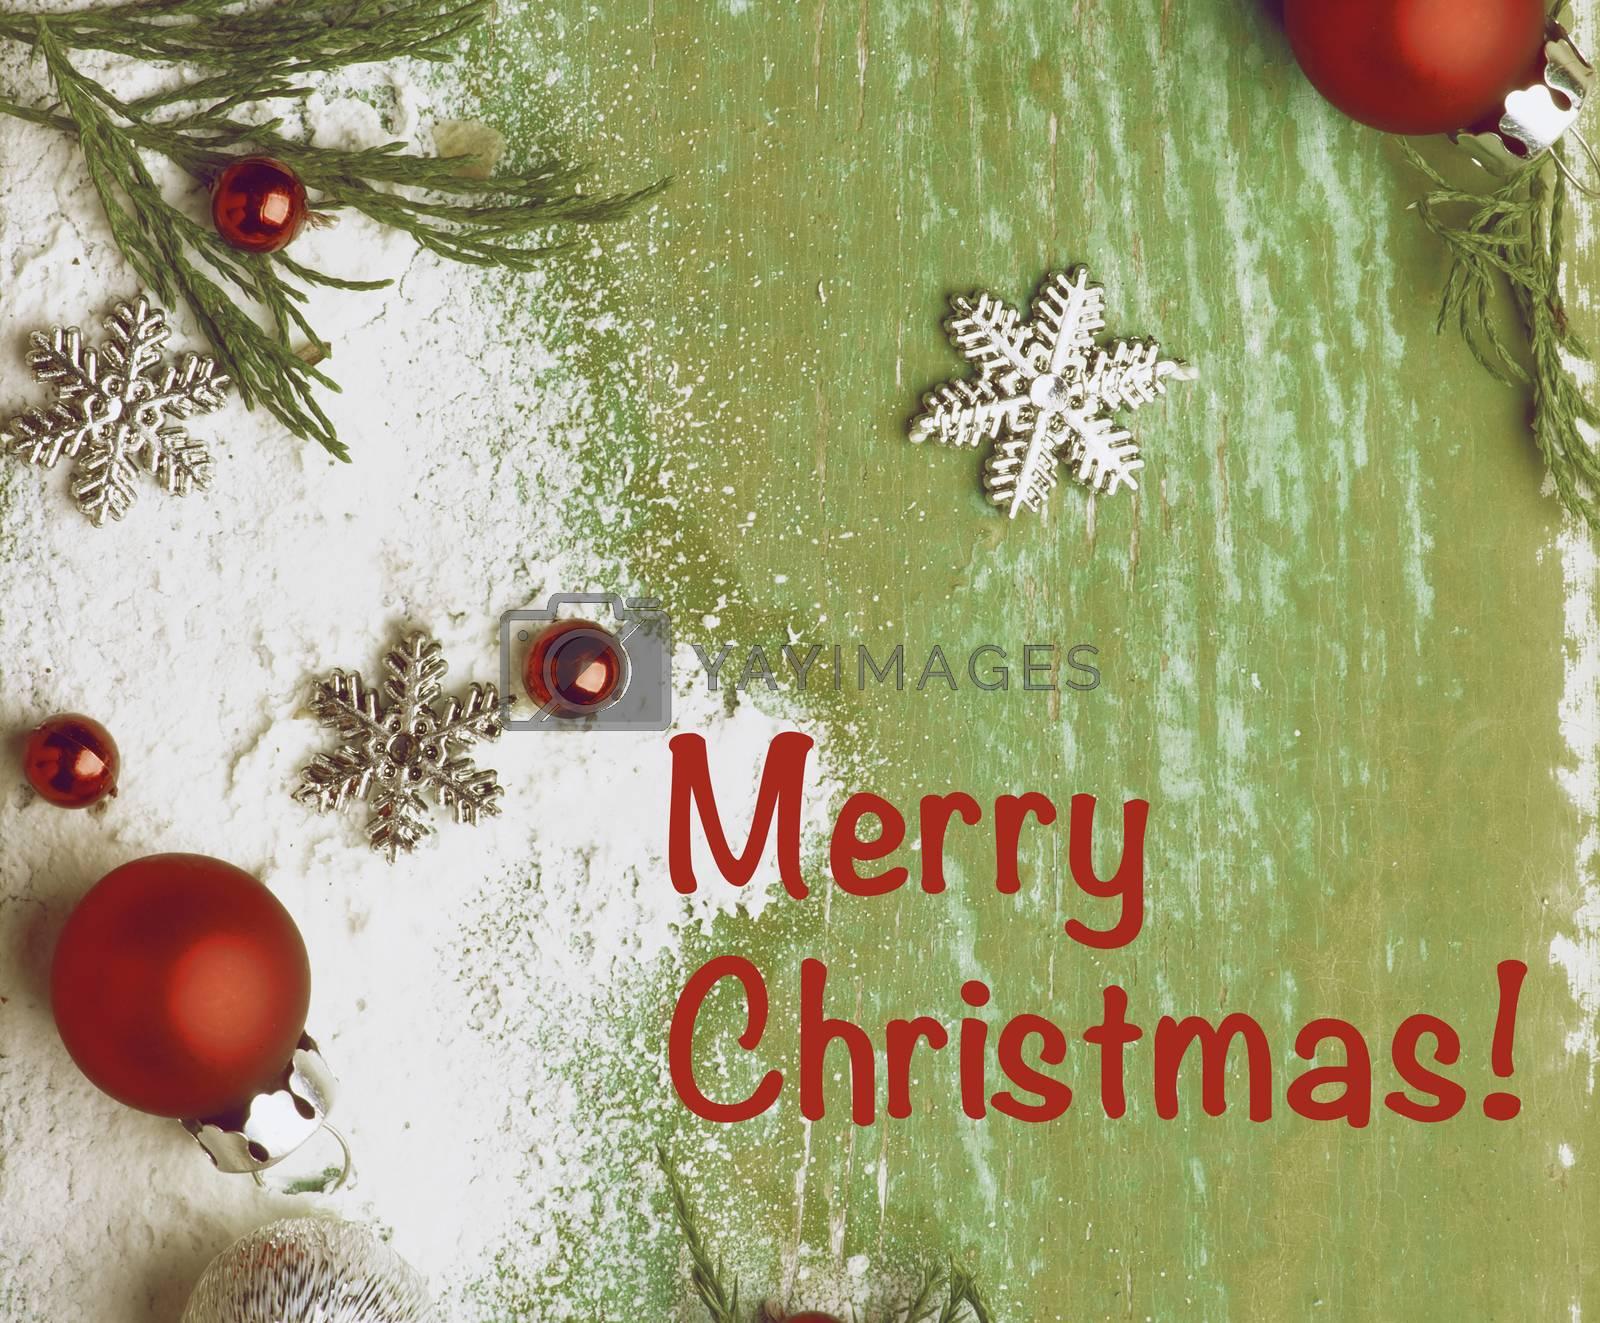 Christmas Greeting Card by zhekos